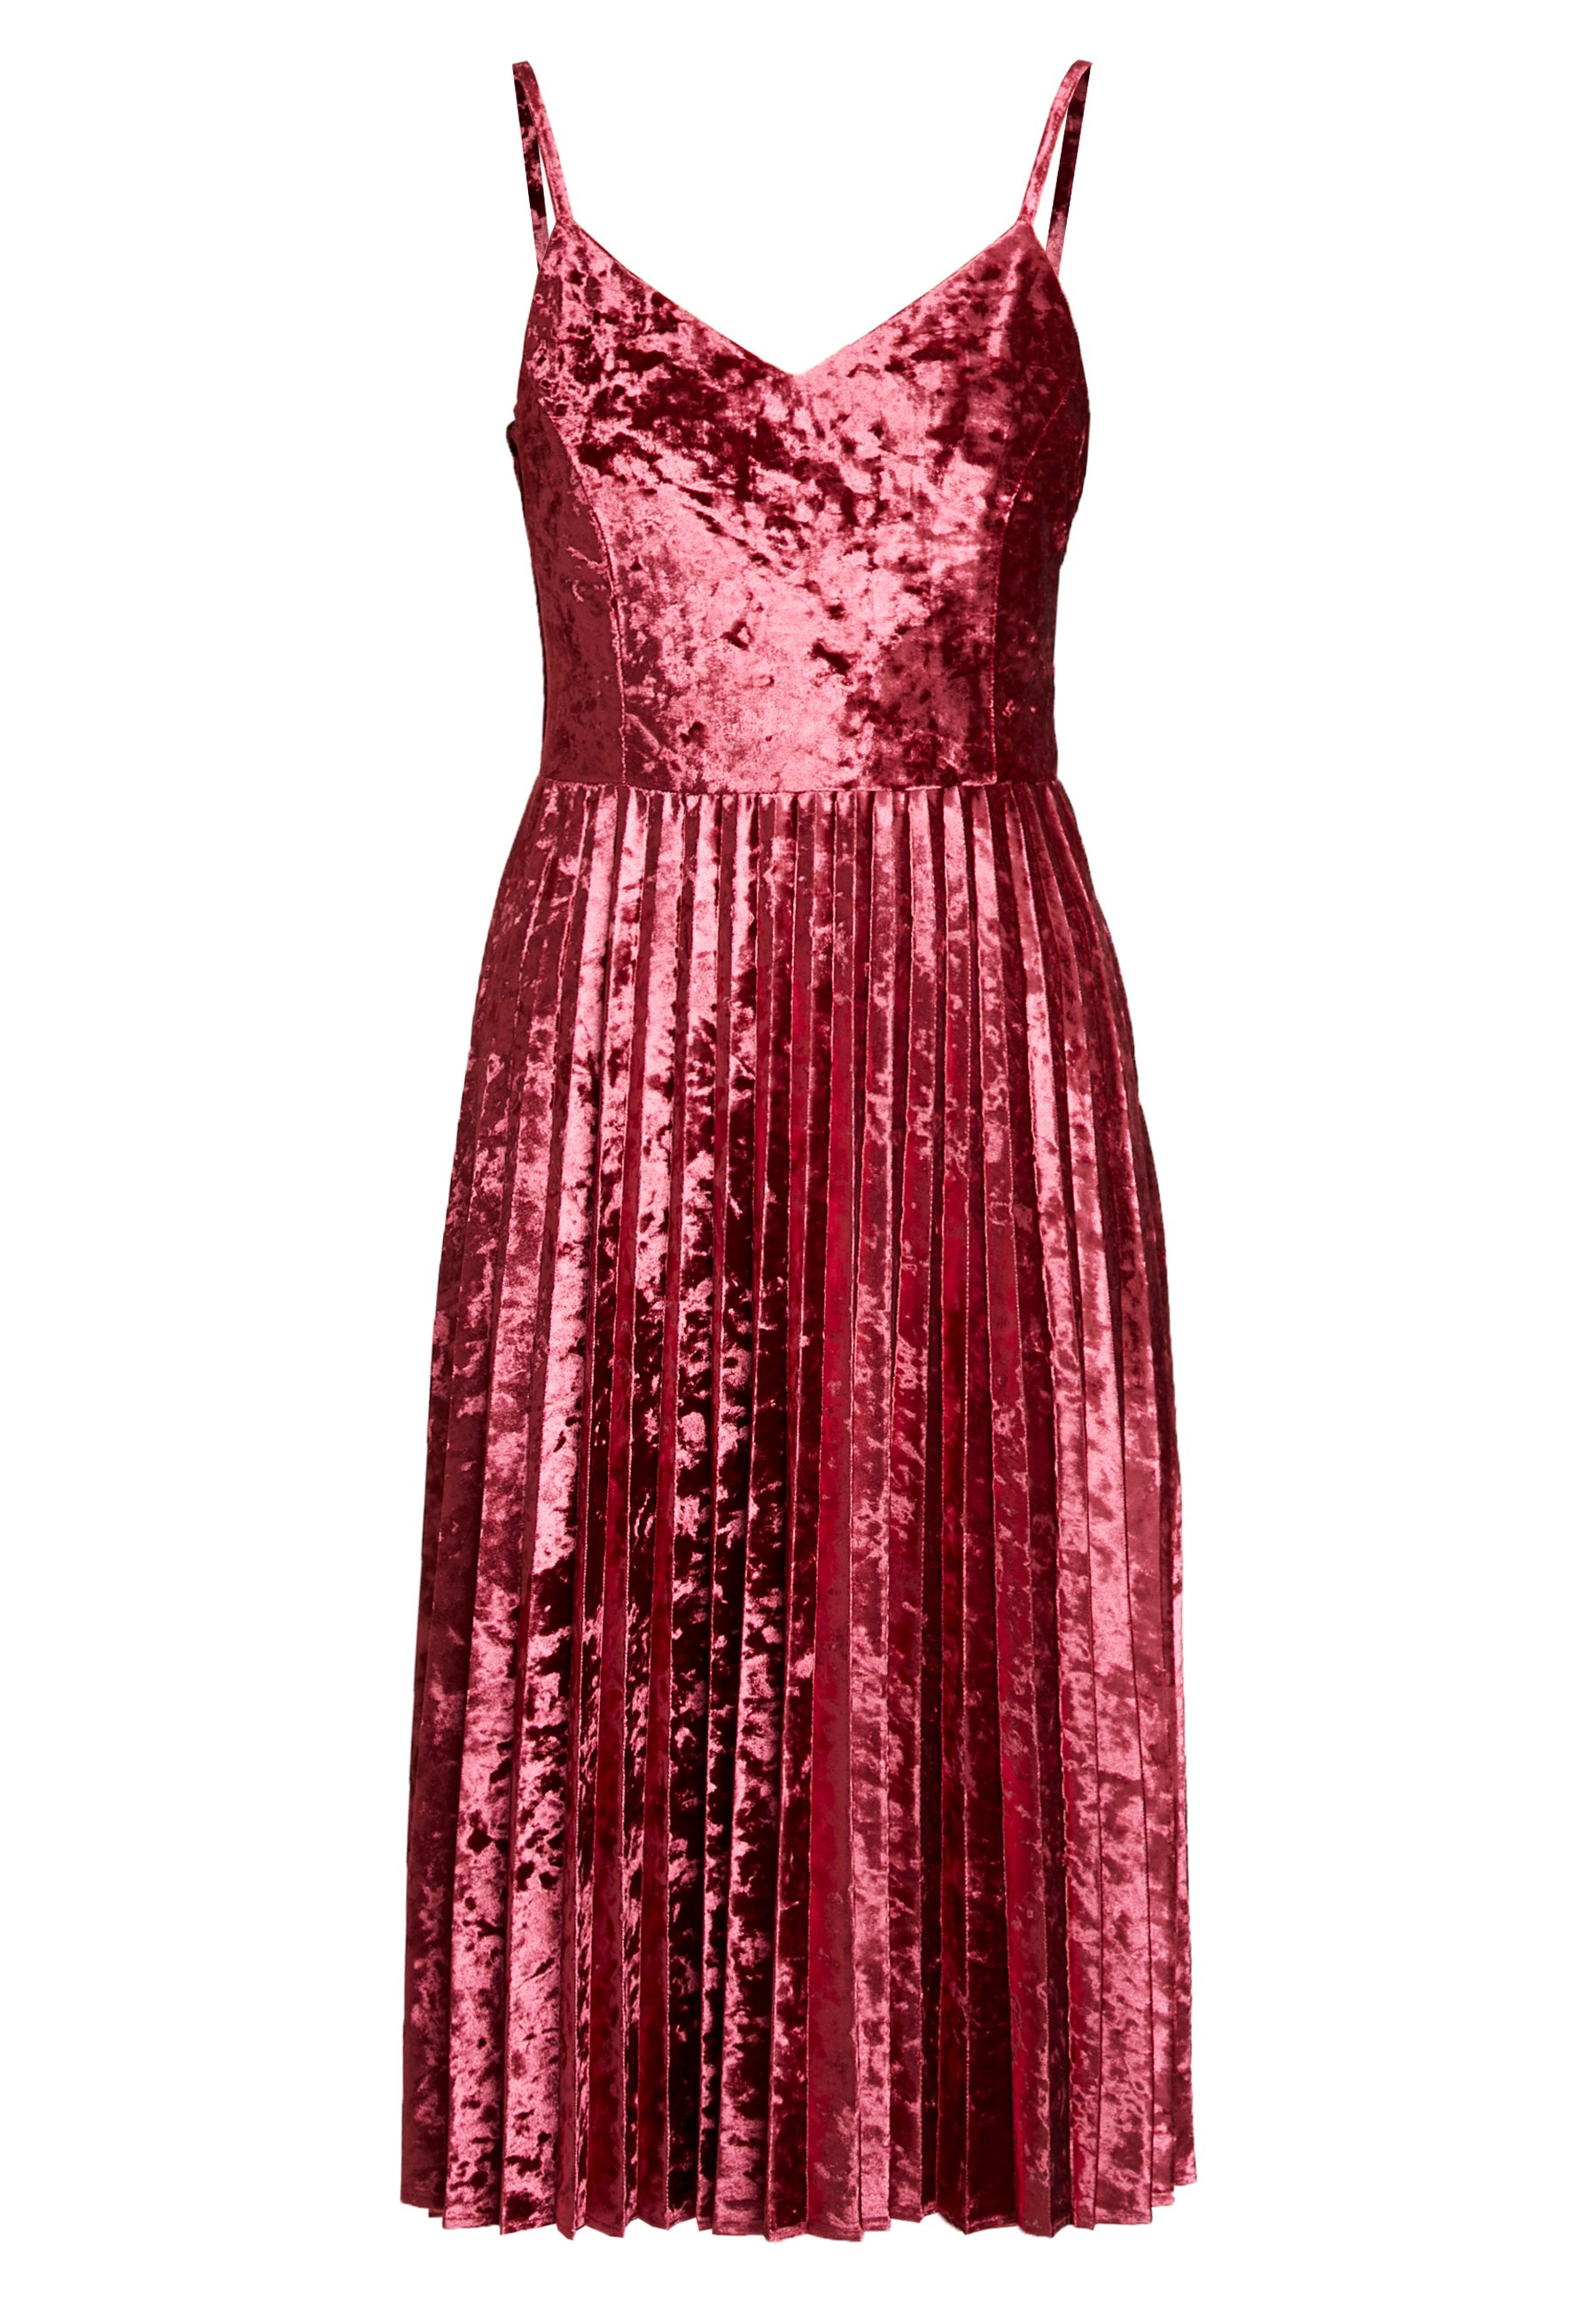 Dorothy Perkins Crushed Velvet Pleated Midi Dress - Cocktailklänning Oxblood